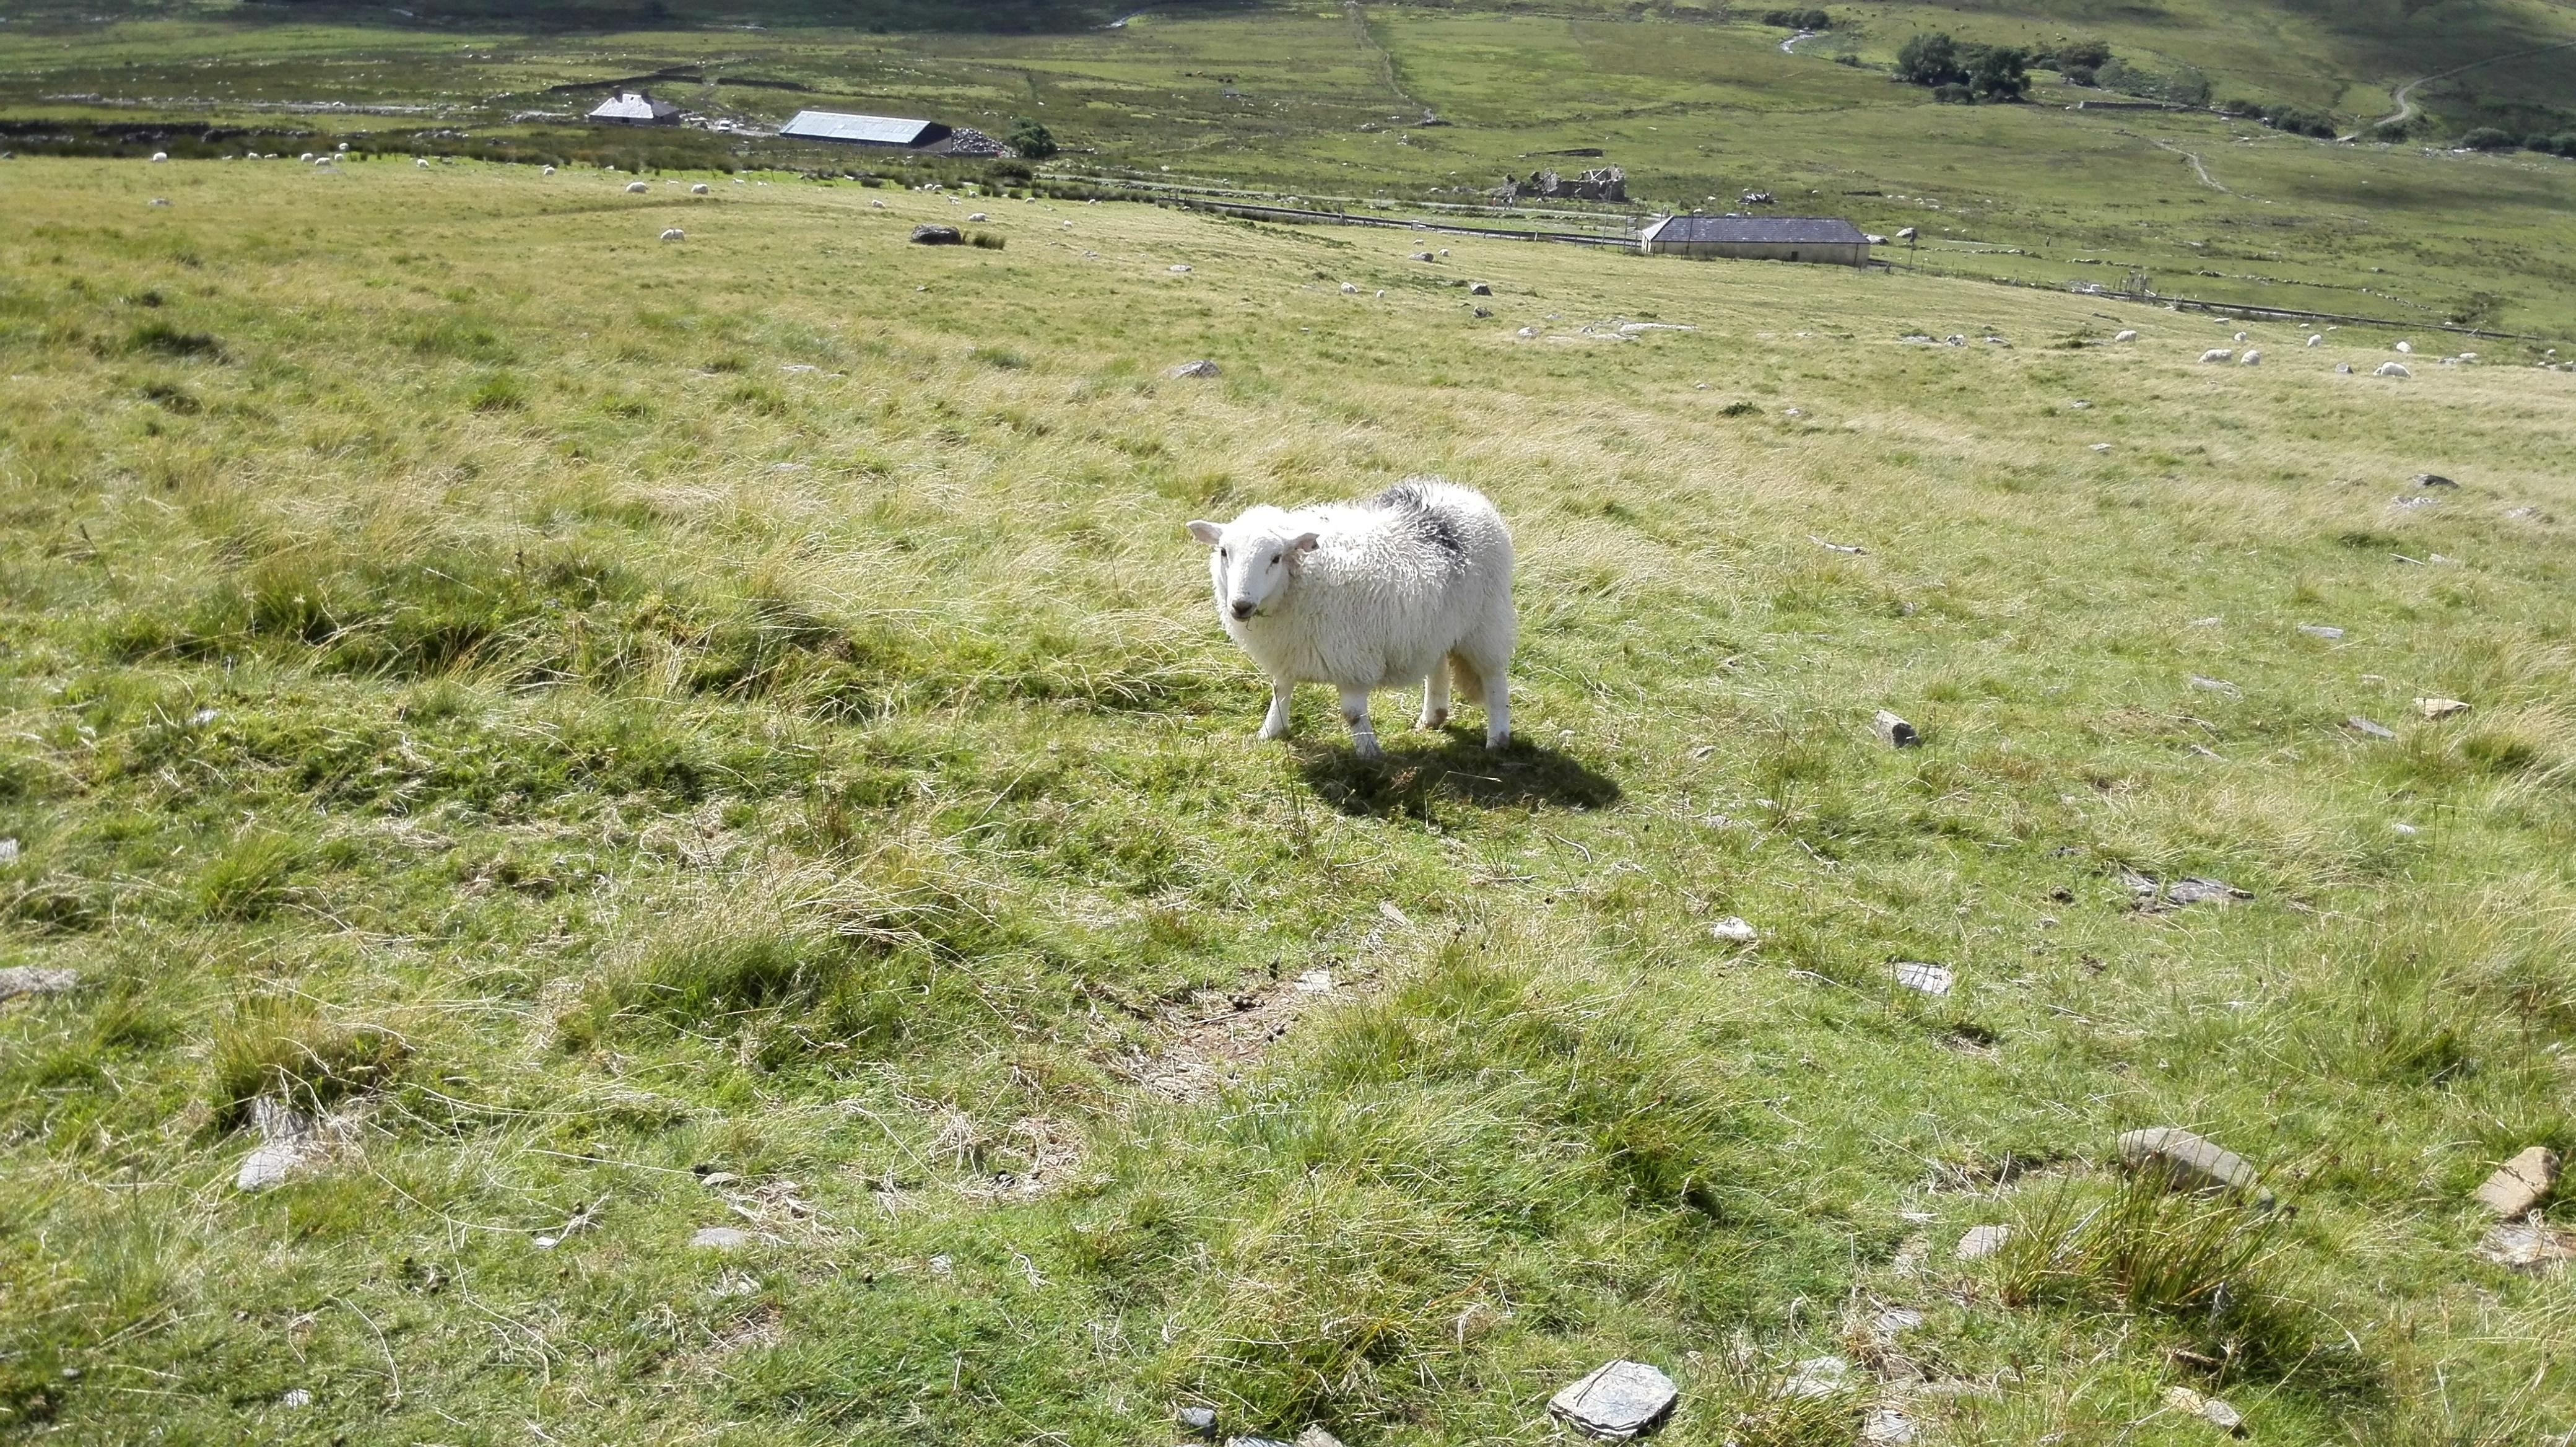 Plenty of sheep but no goats.